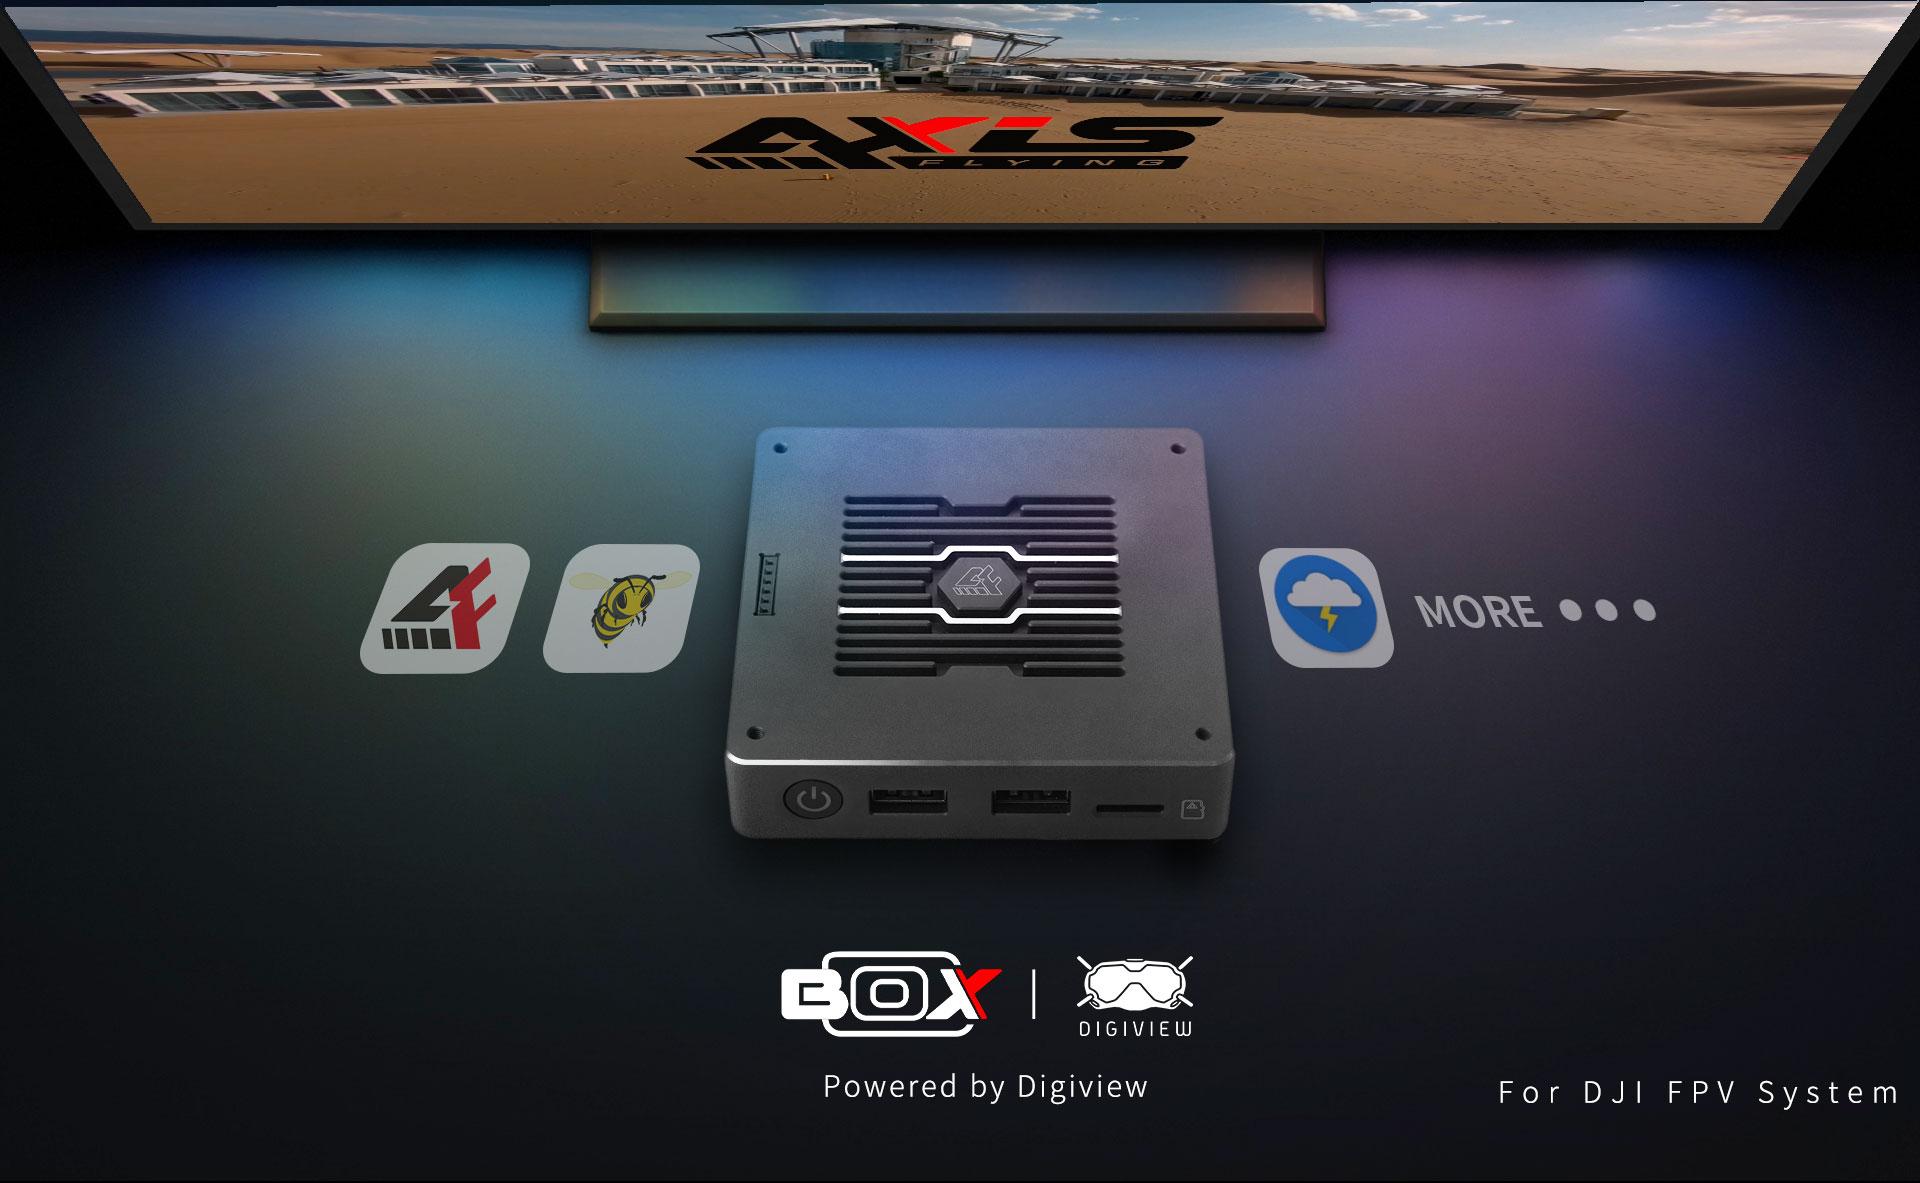 Axis HD BOX